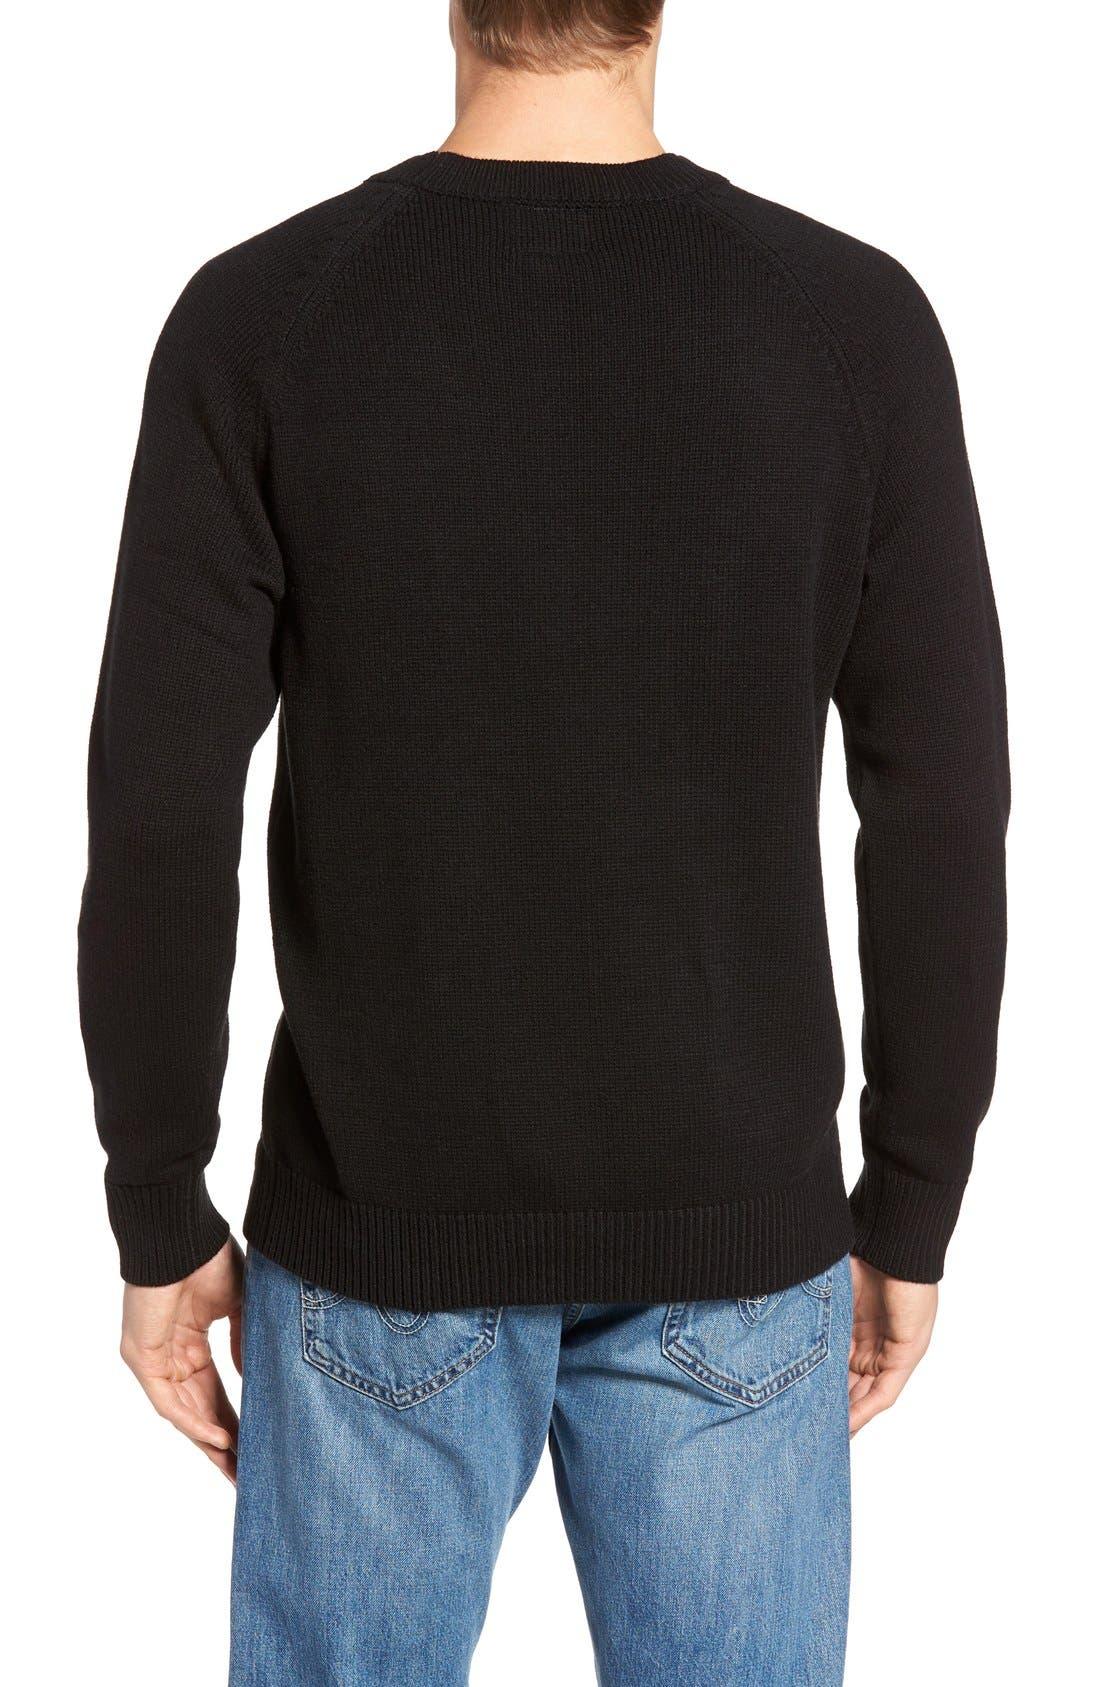 HILLFLINT,                             Iowa Heritage Sweater,                             Alternate thumbnail 2, color,                             001